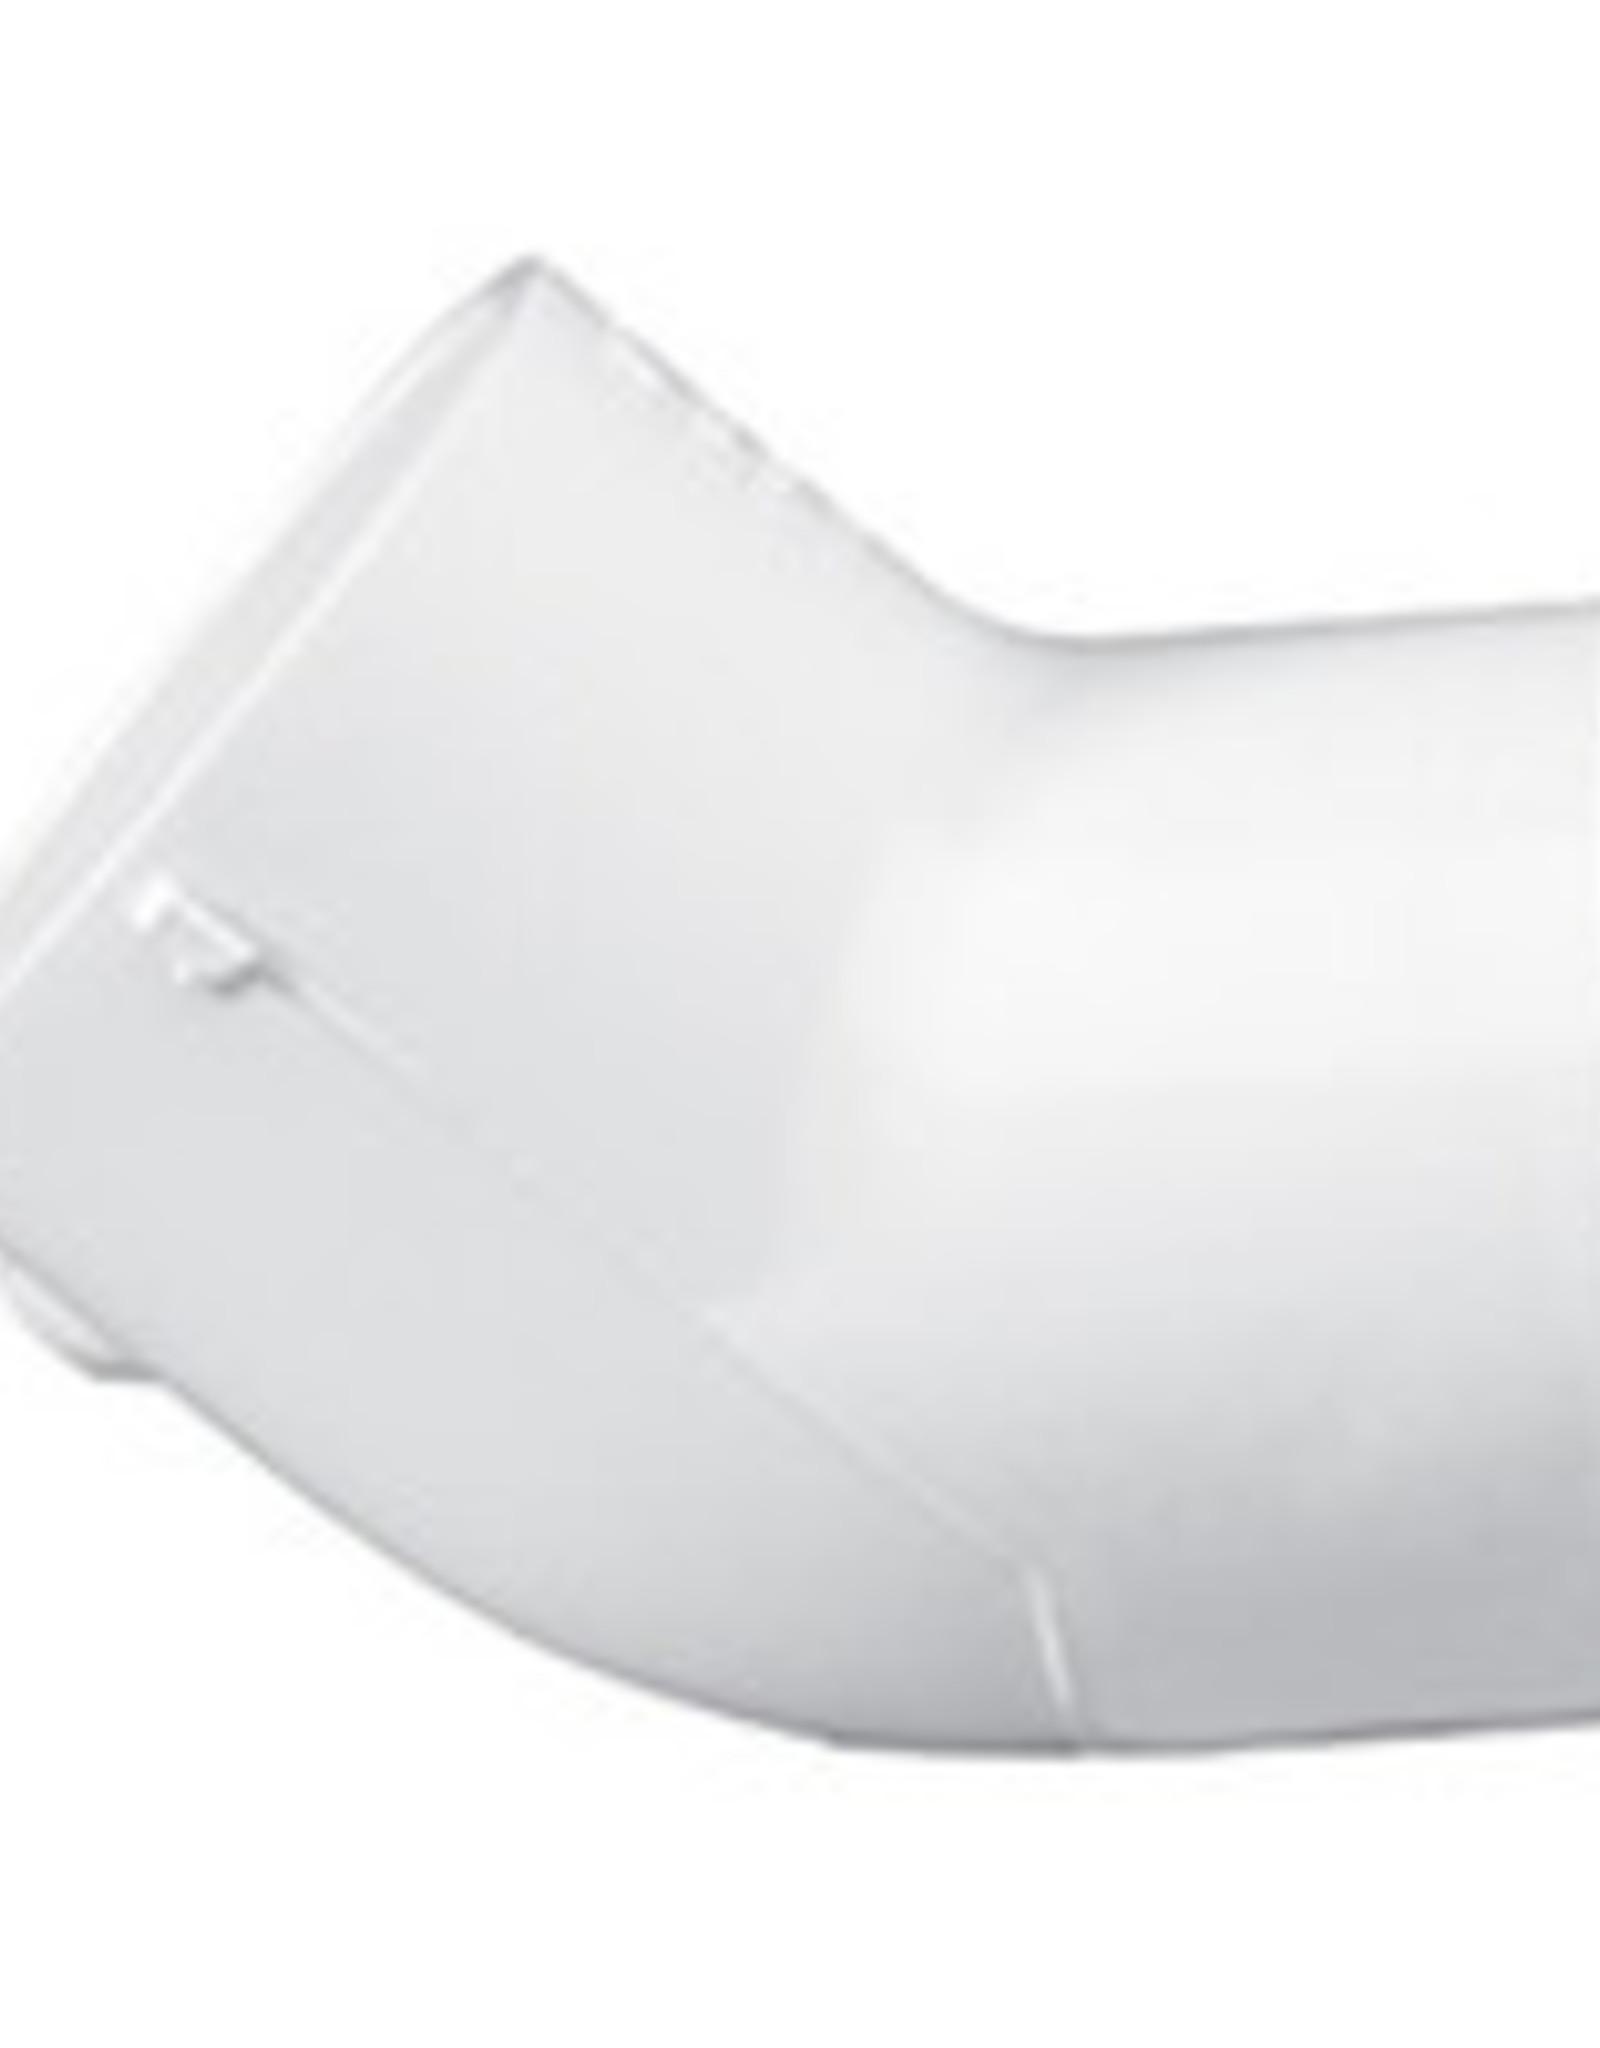 "Lasco Fittings PVC 1"" 45 Degree Elbow Slip x Slip SCH 40"